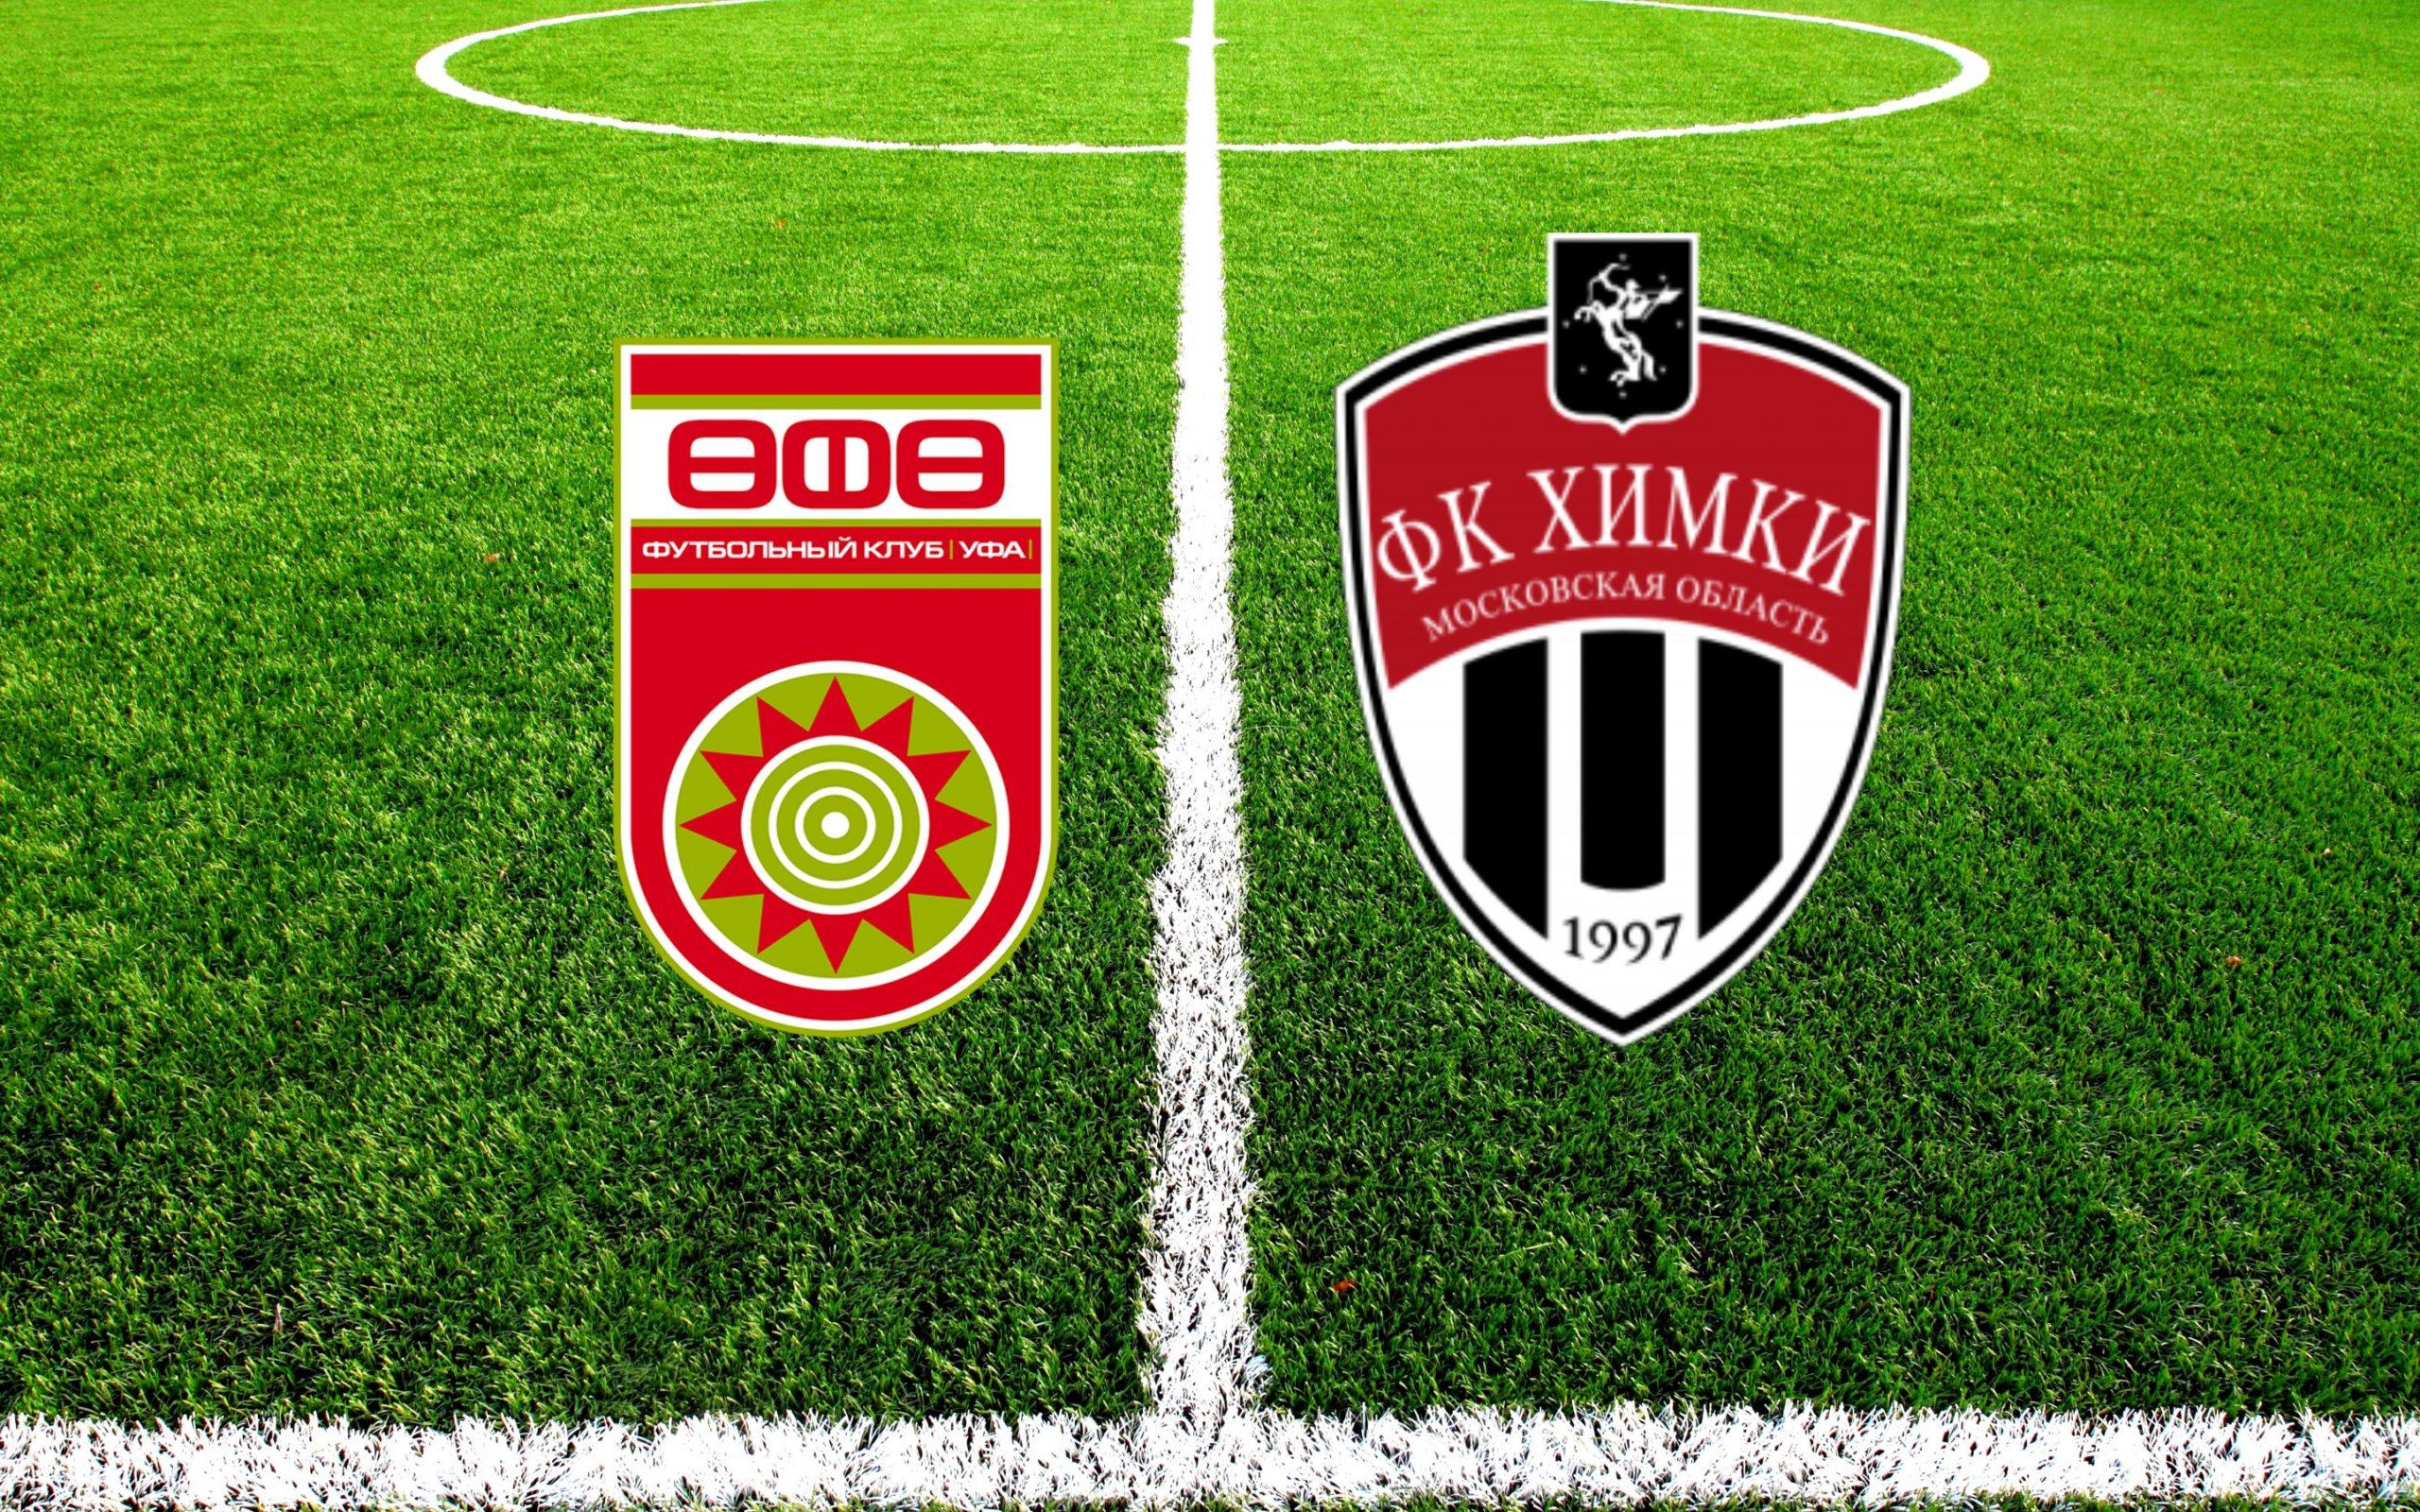 ufa-himki-23-11-2020-video-obzor-matcha